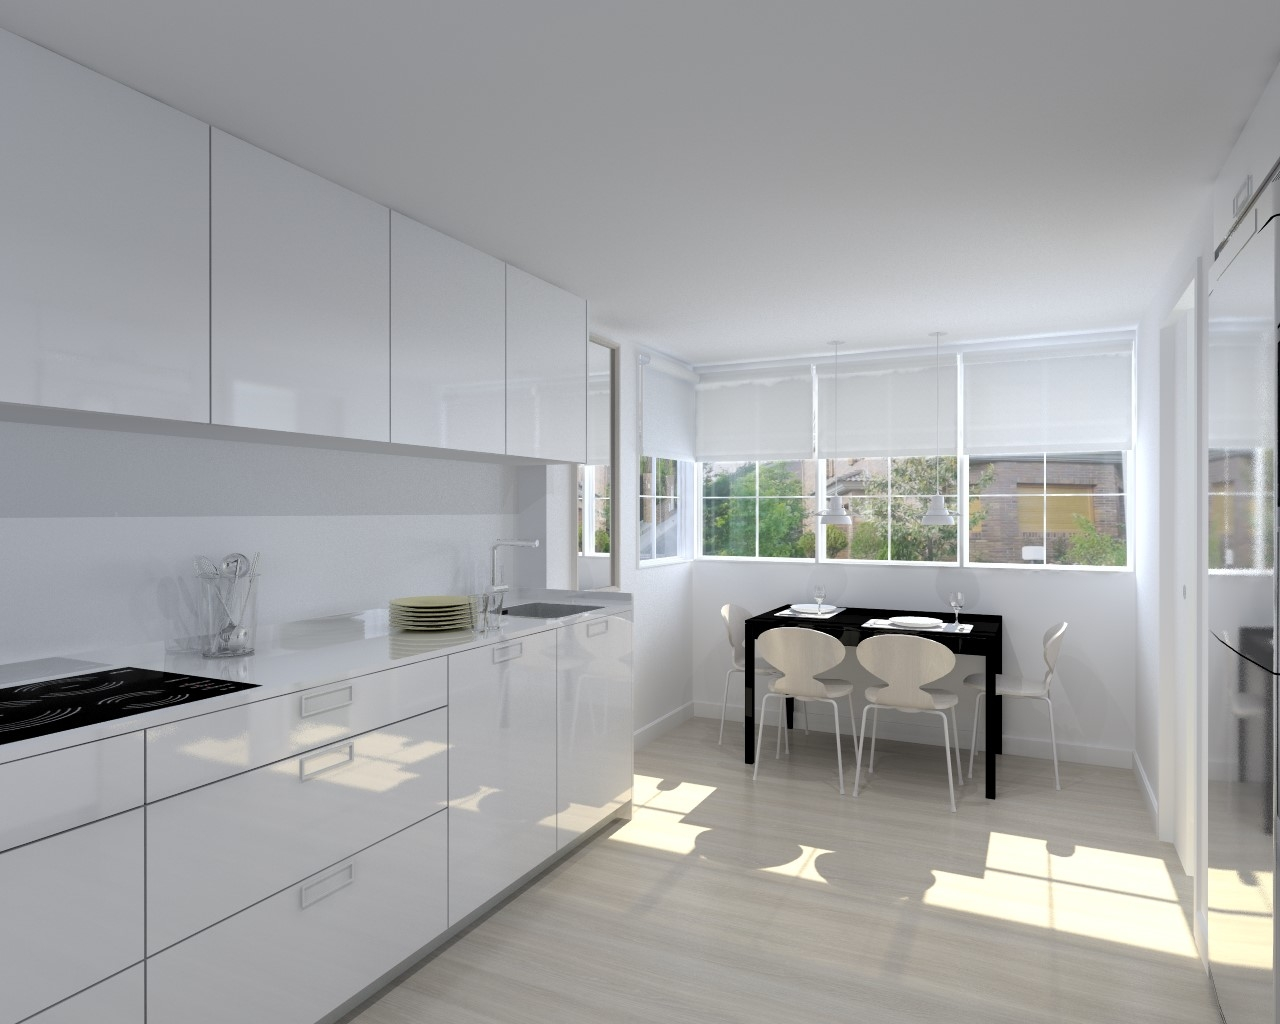 Cocina santos modelo plano blanco brillo encimera neolith for Modelos de cocinas 2016